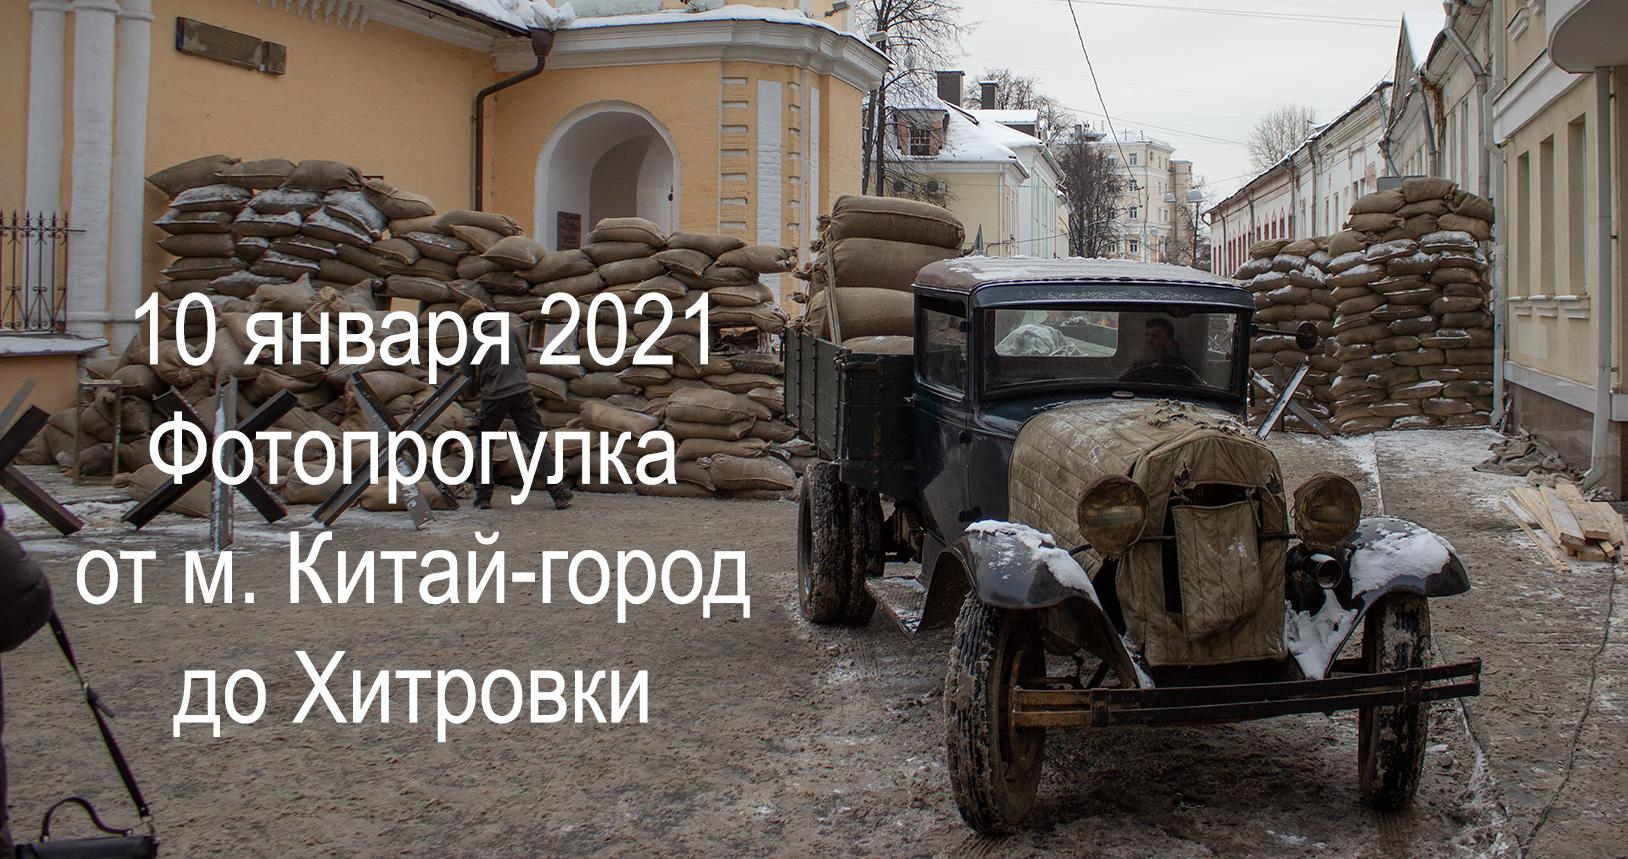 fotoiprogulka-01-10-2021-cover-2